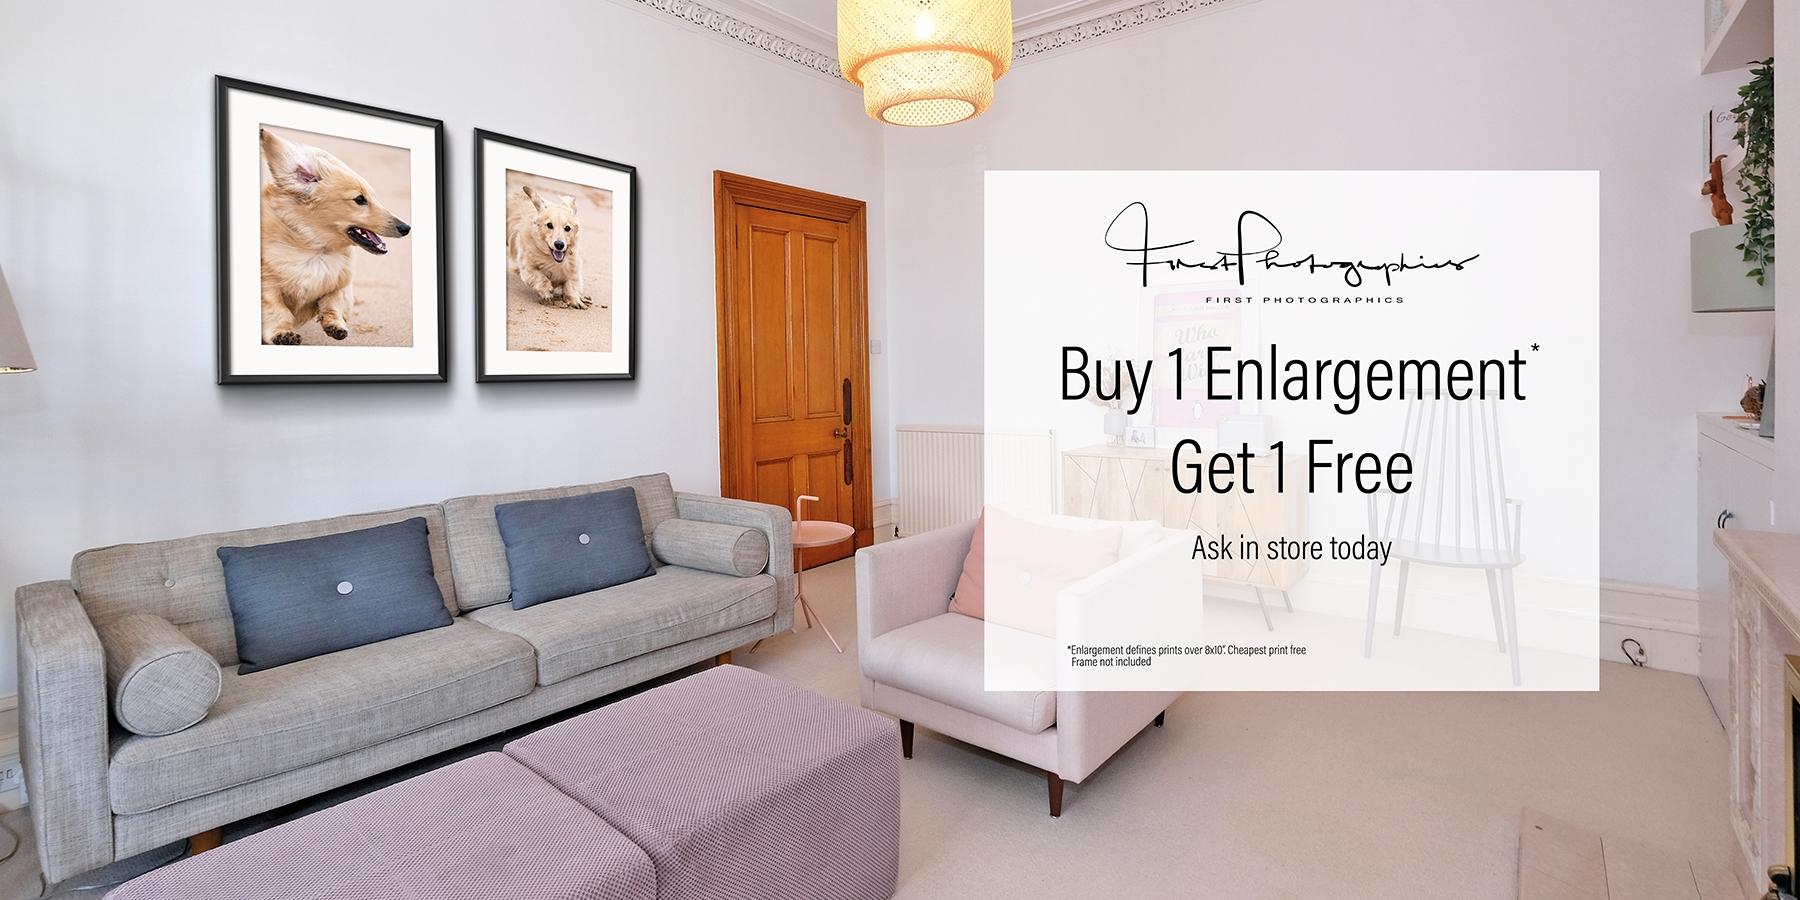 Buy 1 enlargement...get 1 FREE